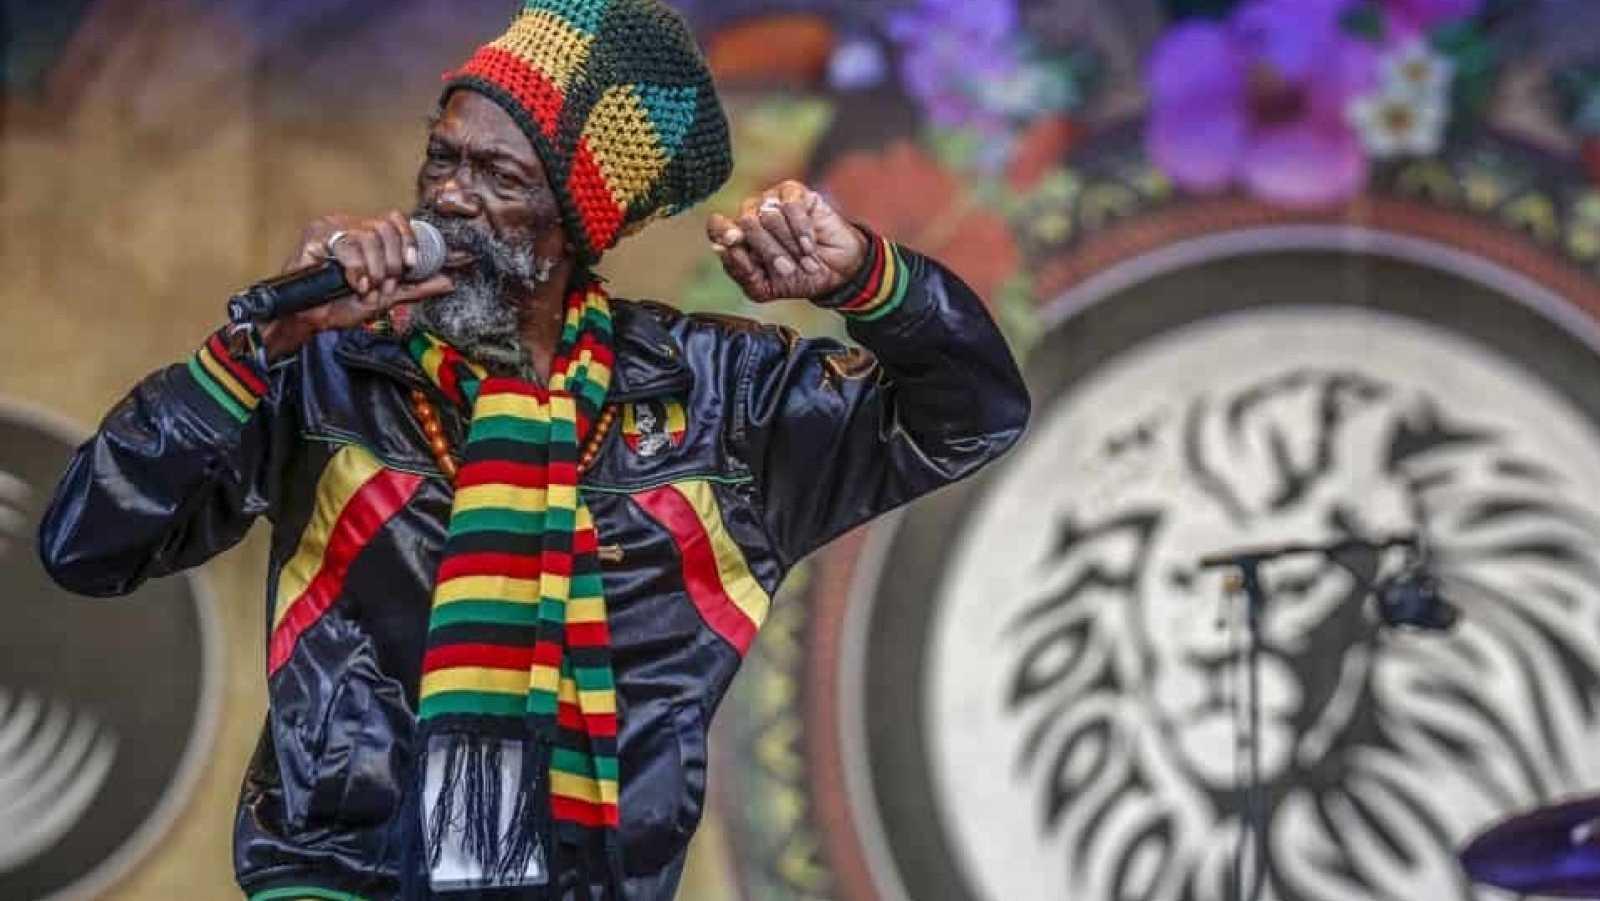 Festivales - Rototom 2019: The Abyssinians - 20/08/19 - Escuchar ahora